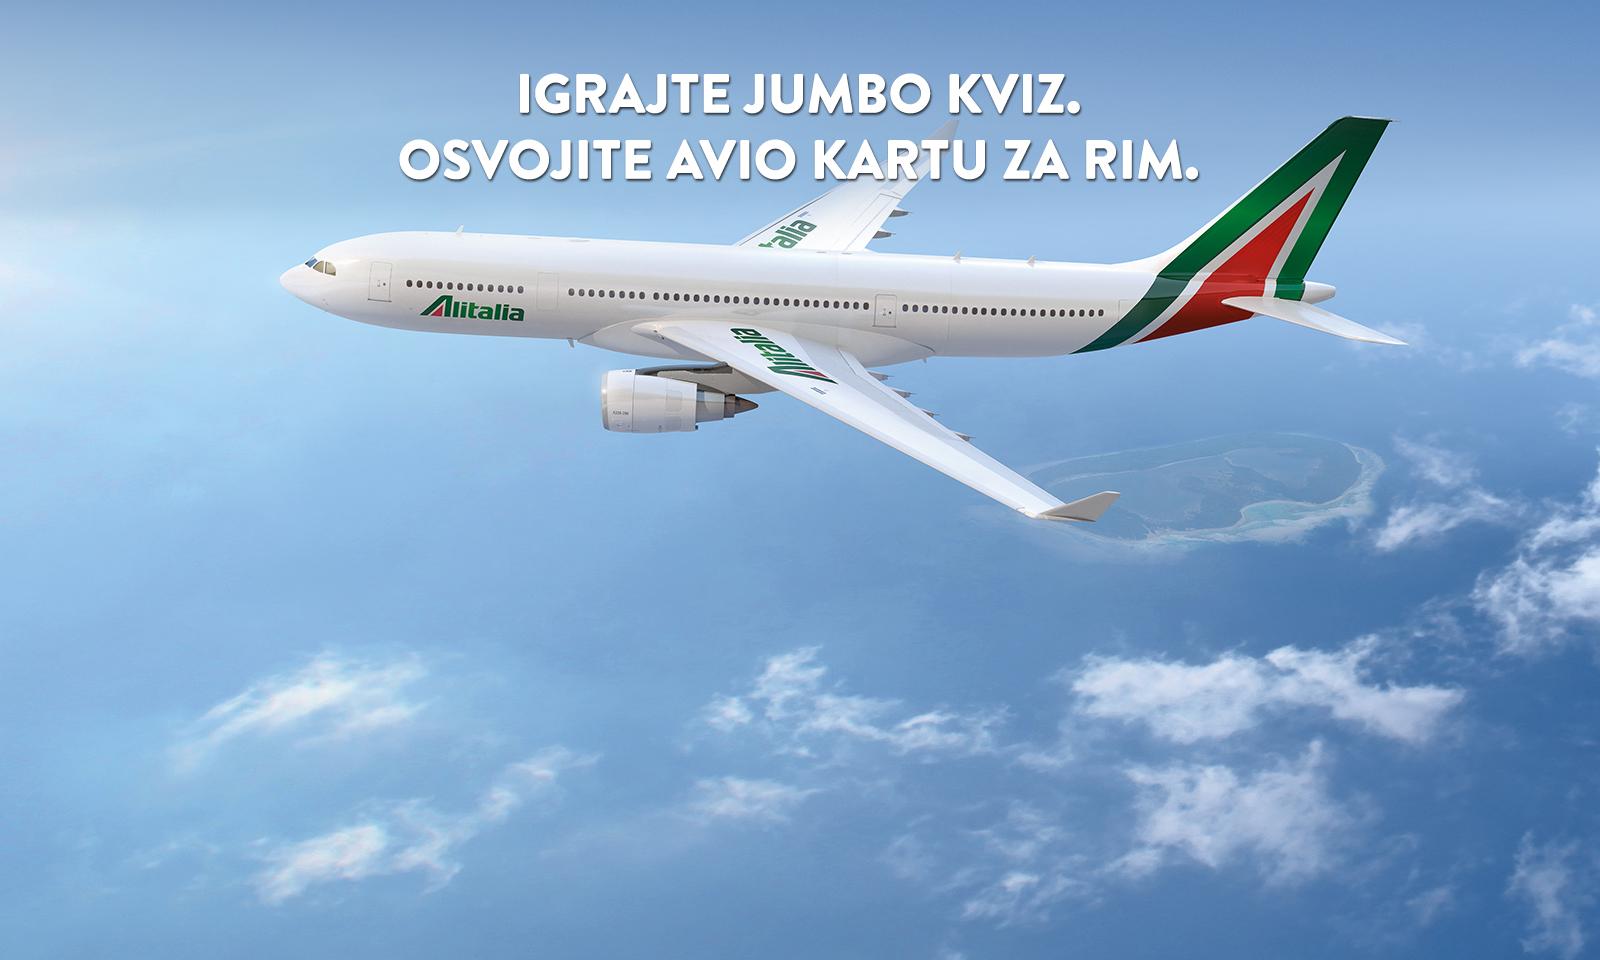 Alitalia i Jumbo travel kviz